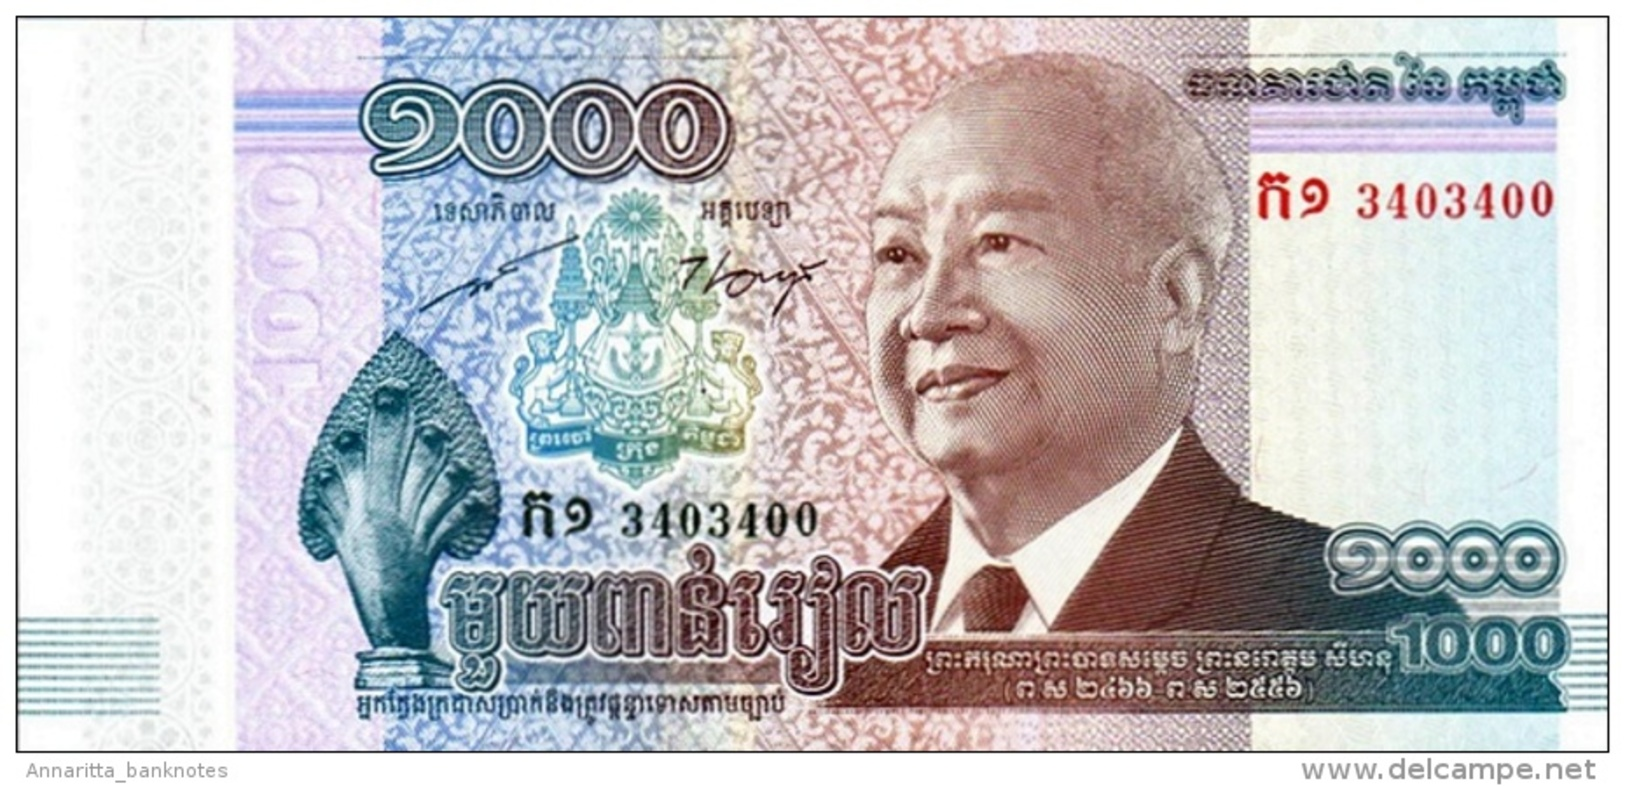 CAMBODIA 1000 RIELS 2012 (2013) P-63a UNC COMMEMORATIVE [ KH424a ] - Cambodia